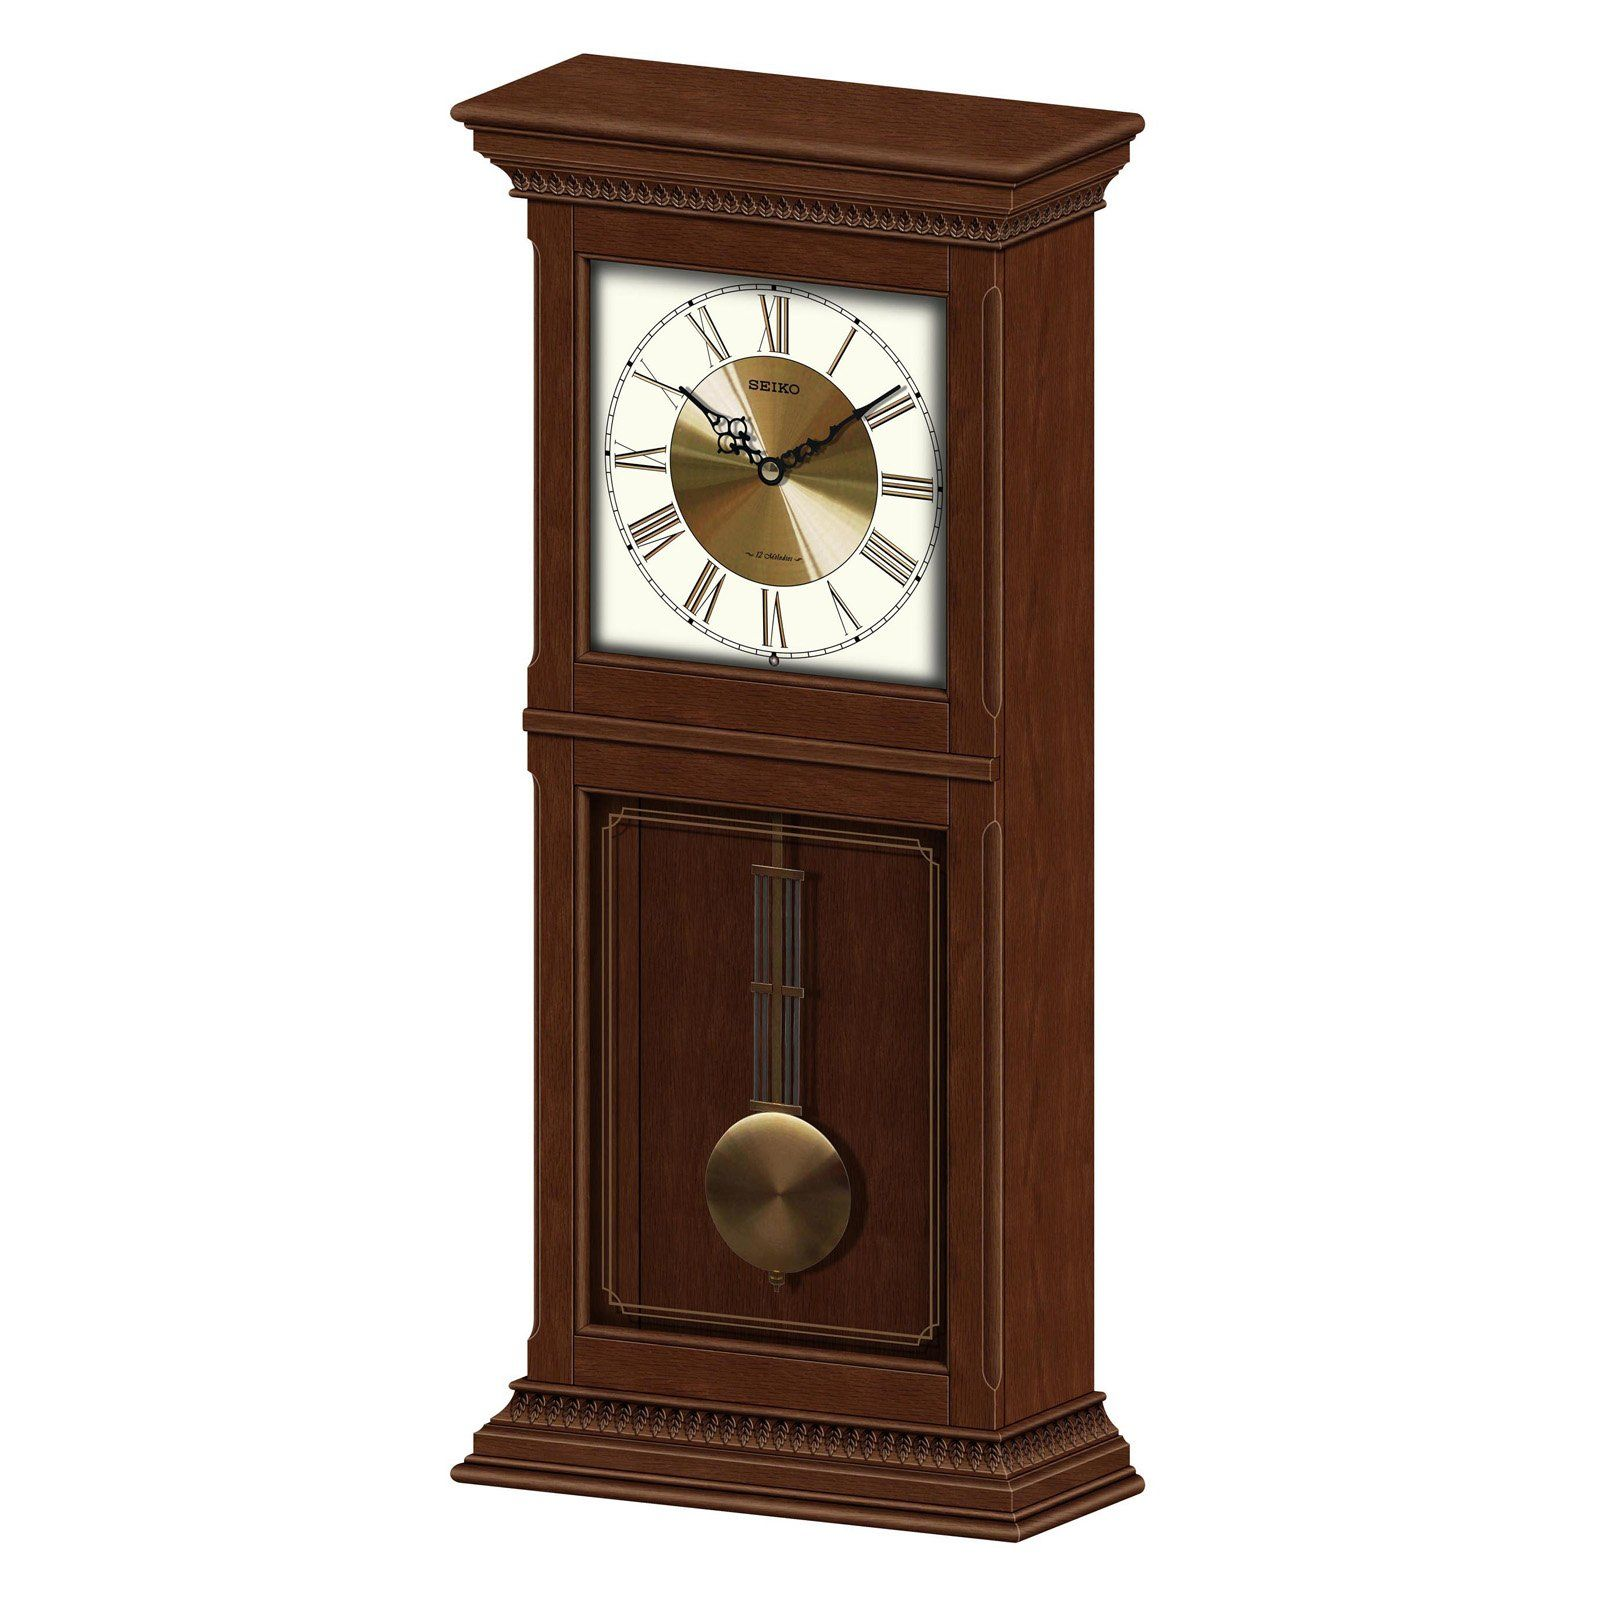 Seiko Cambridge Mantel Pendulum Clock Dark Brown Wooden Case Pendulum Clock Clock